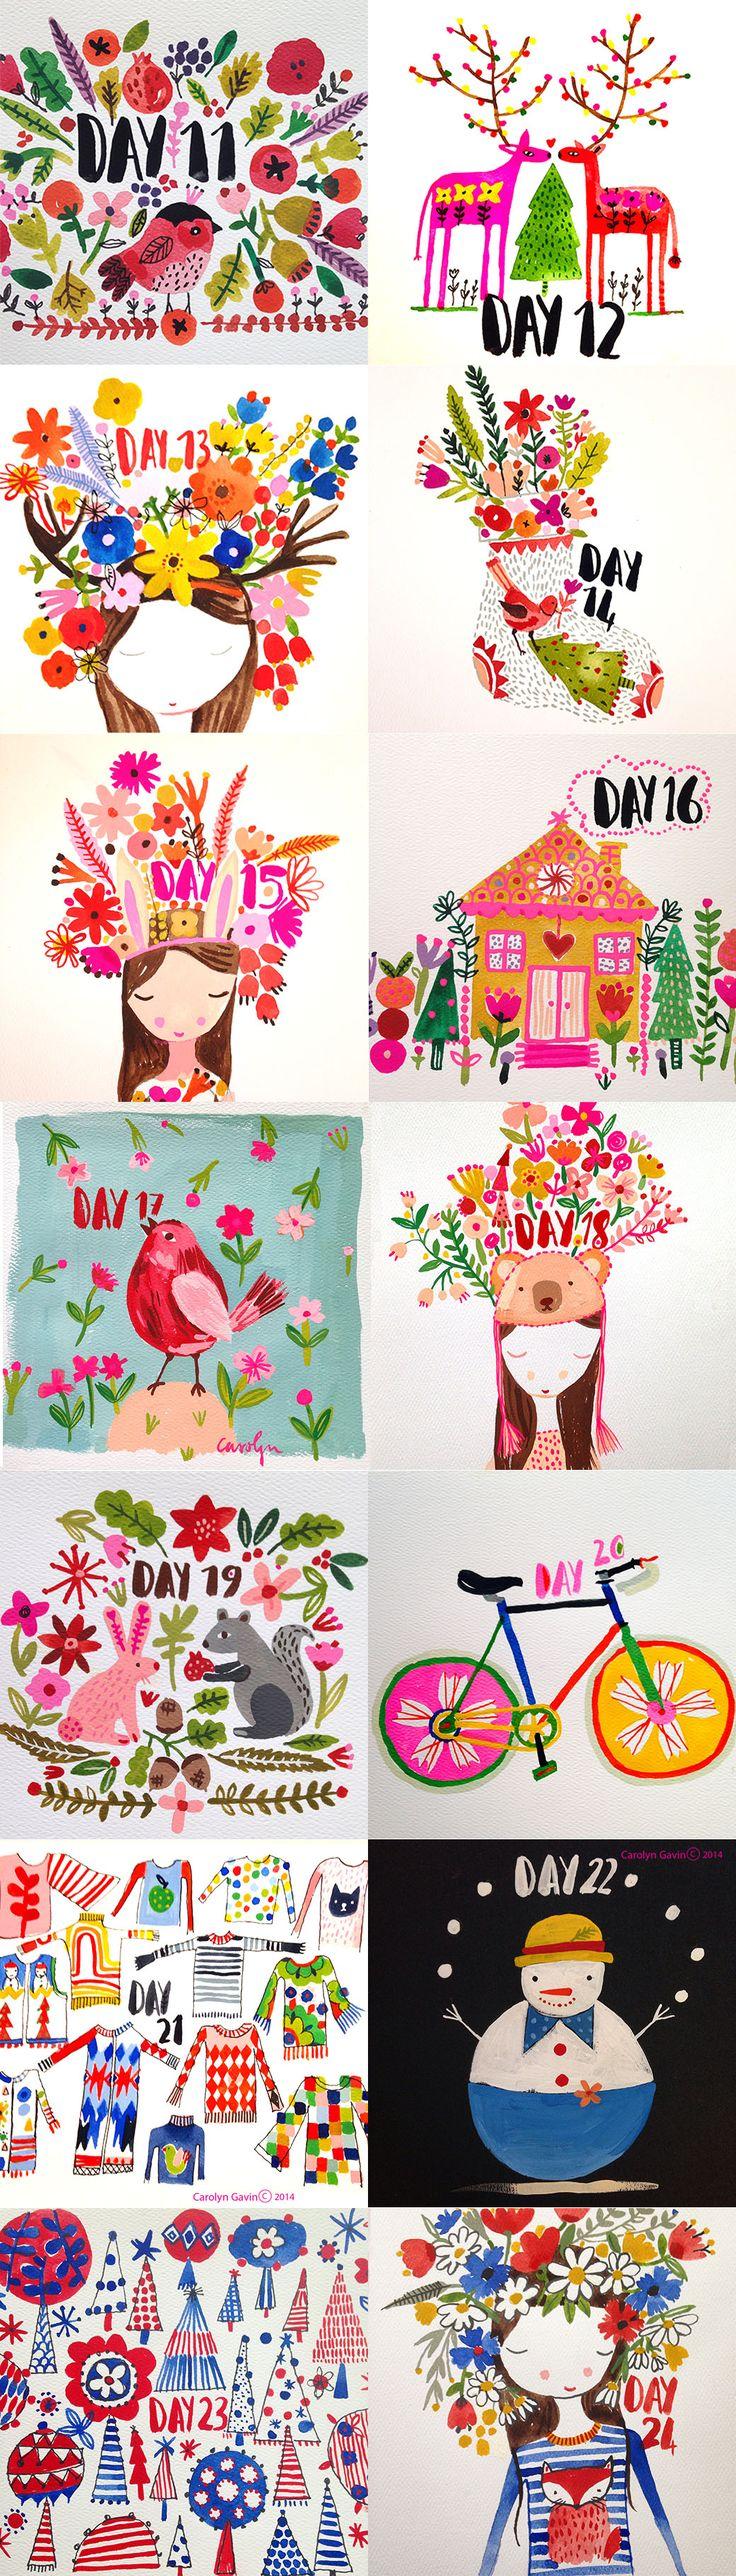 designs from ecojot designer Carolyn Gavin - BLOG see more on my IG feed carolynj